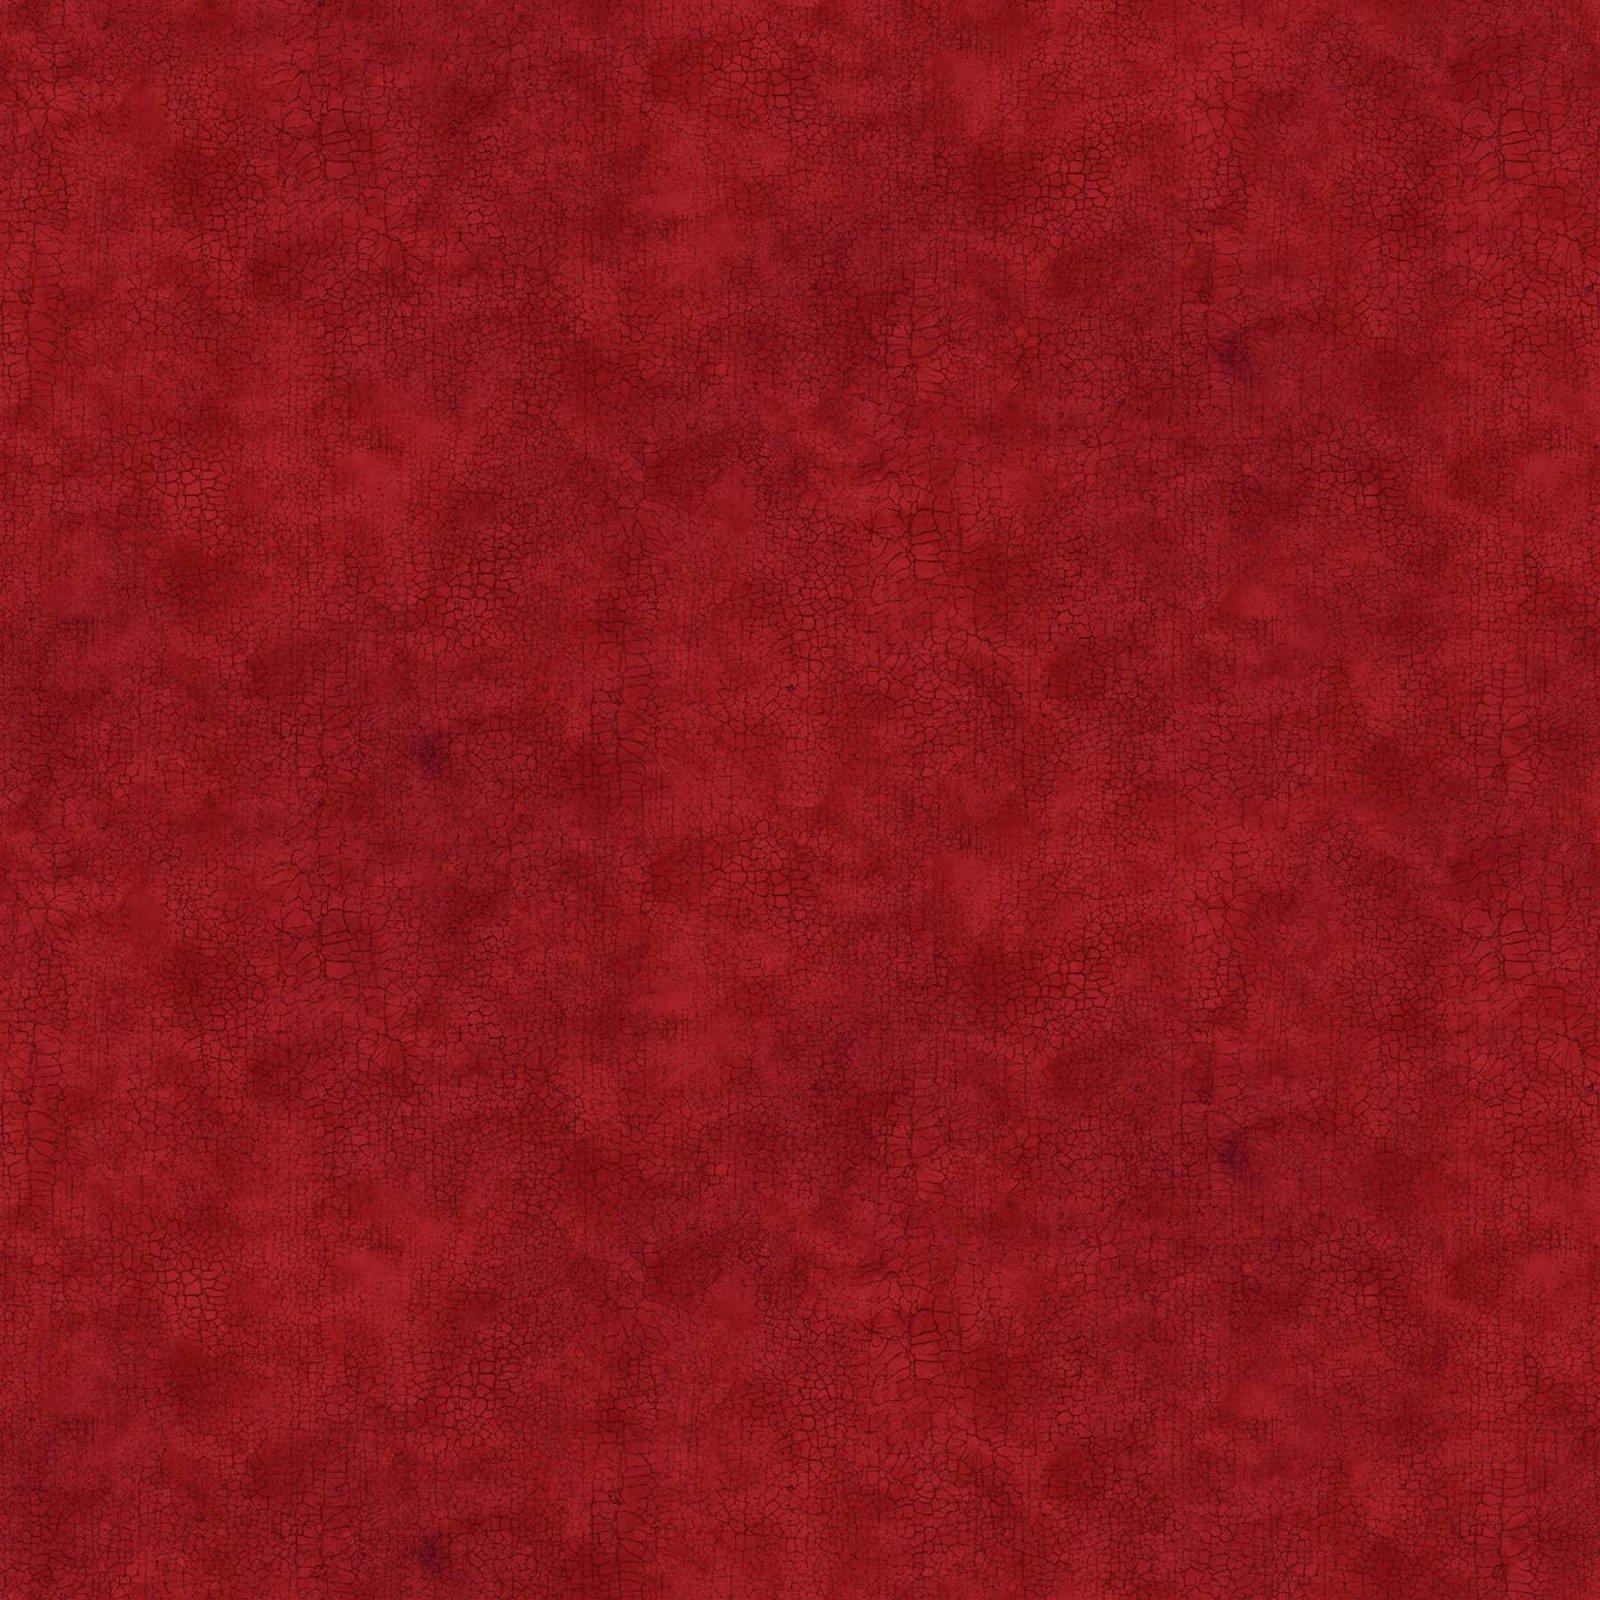 Northcott CRACKLE  9045-24 CRANBERRY Textured Tonal